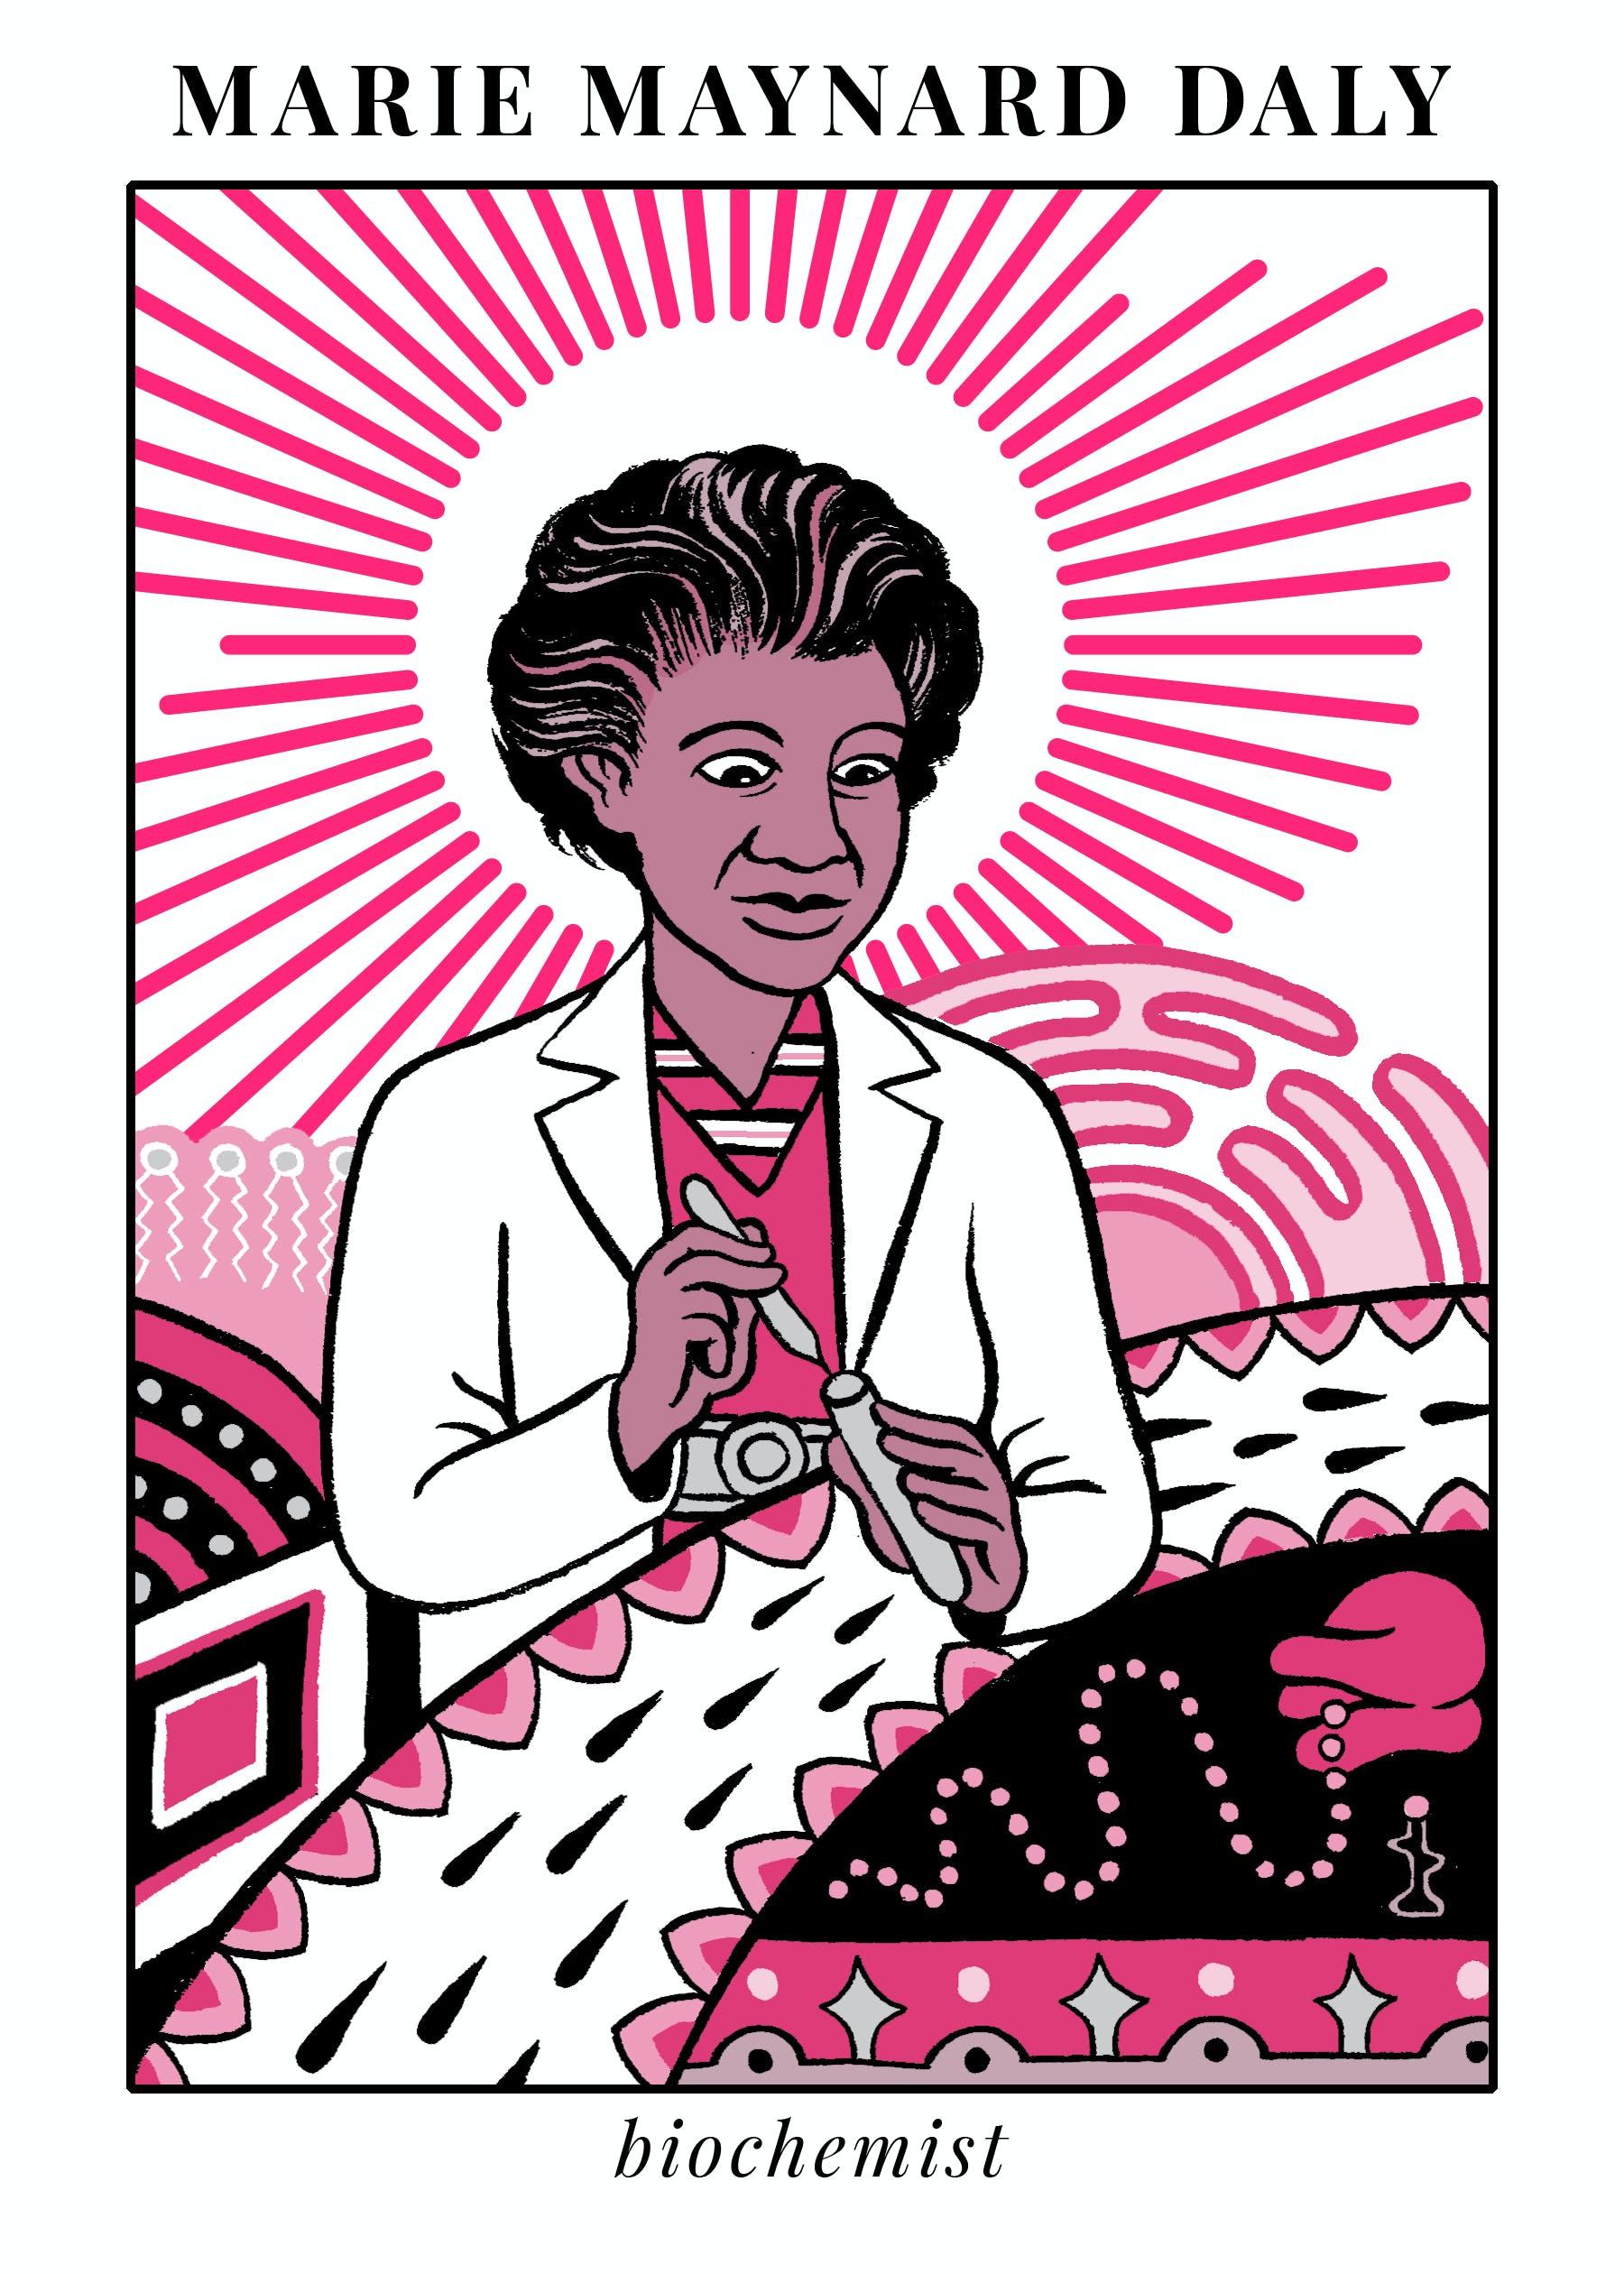 Marie Maynard Daly biochemist